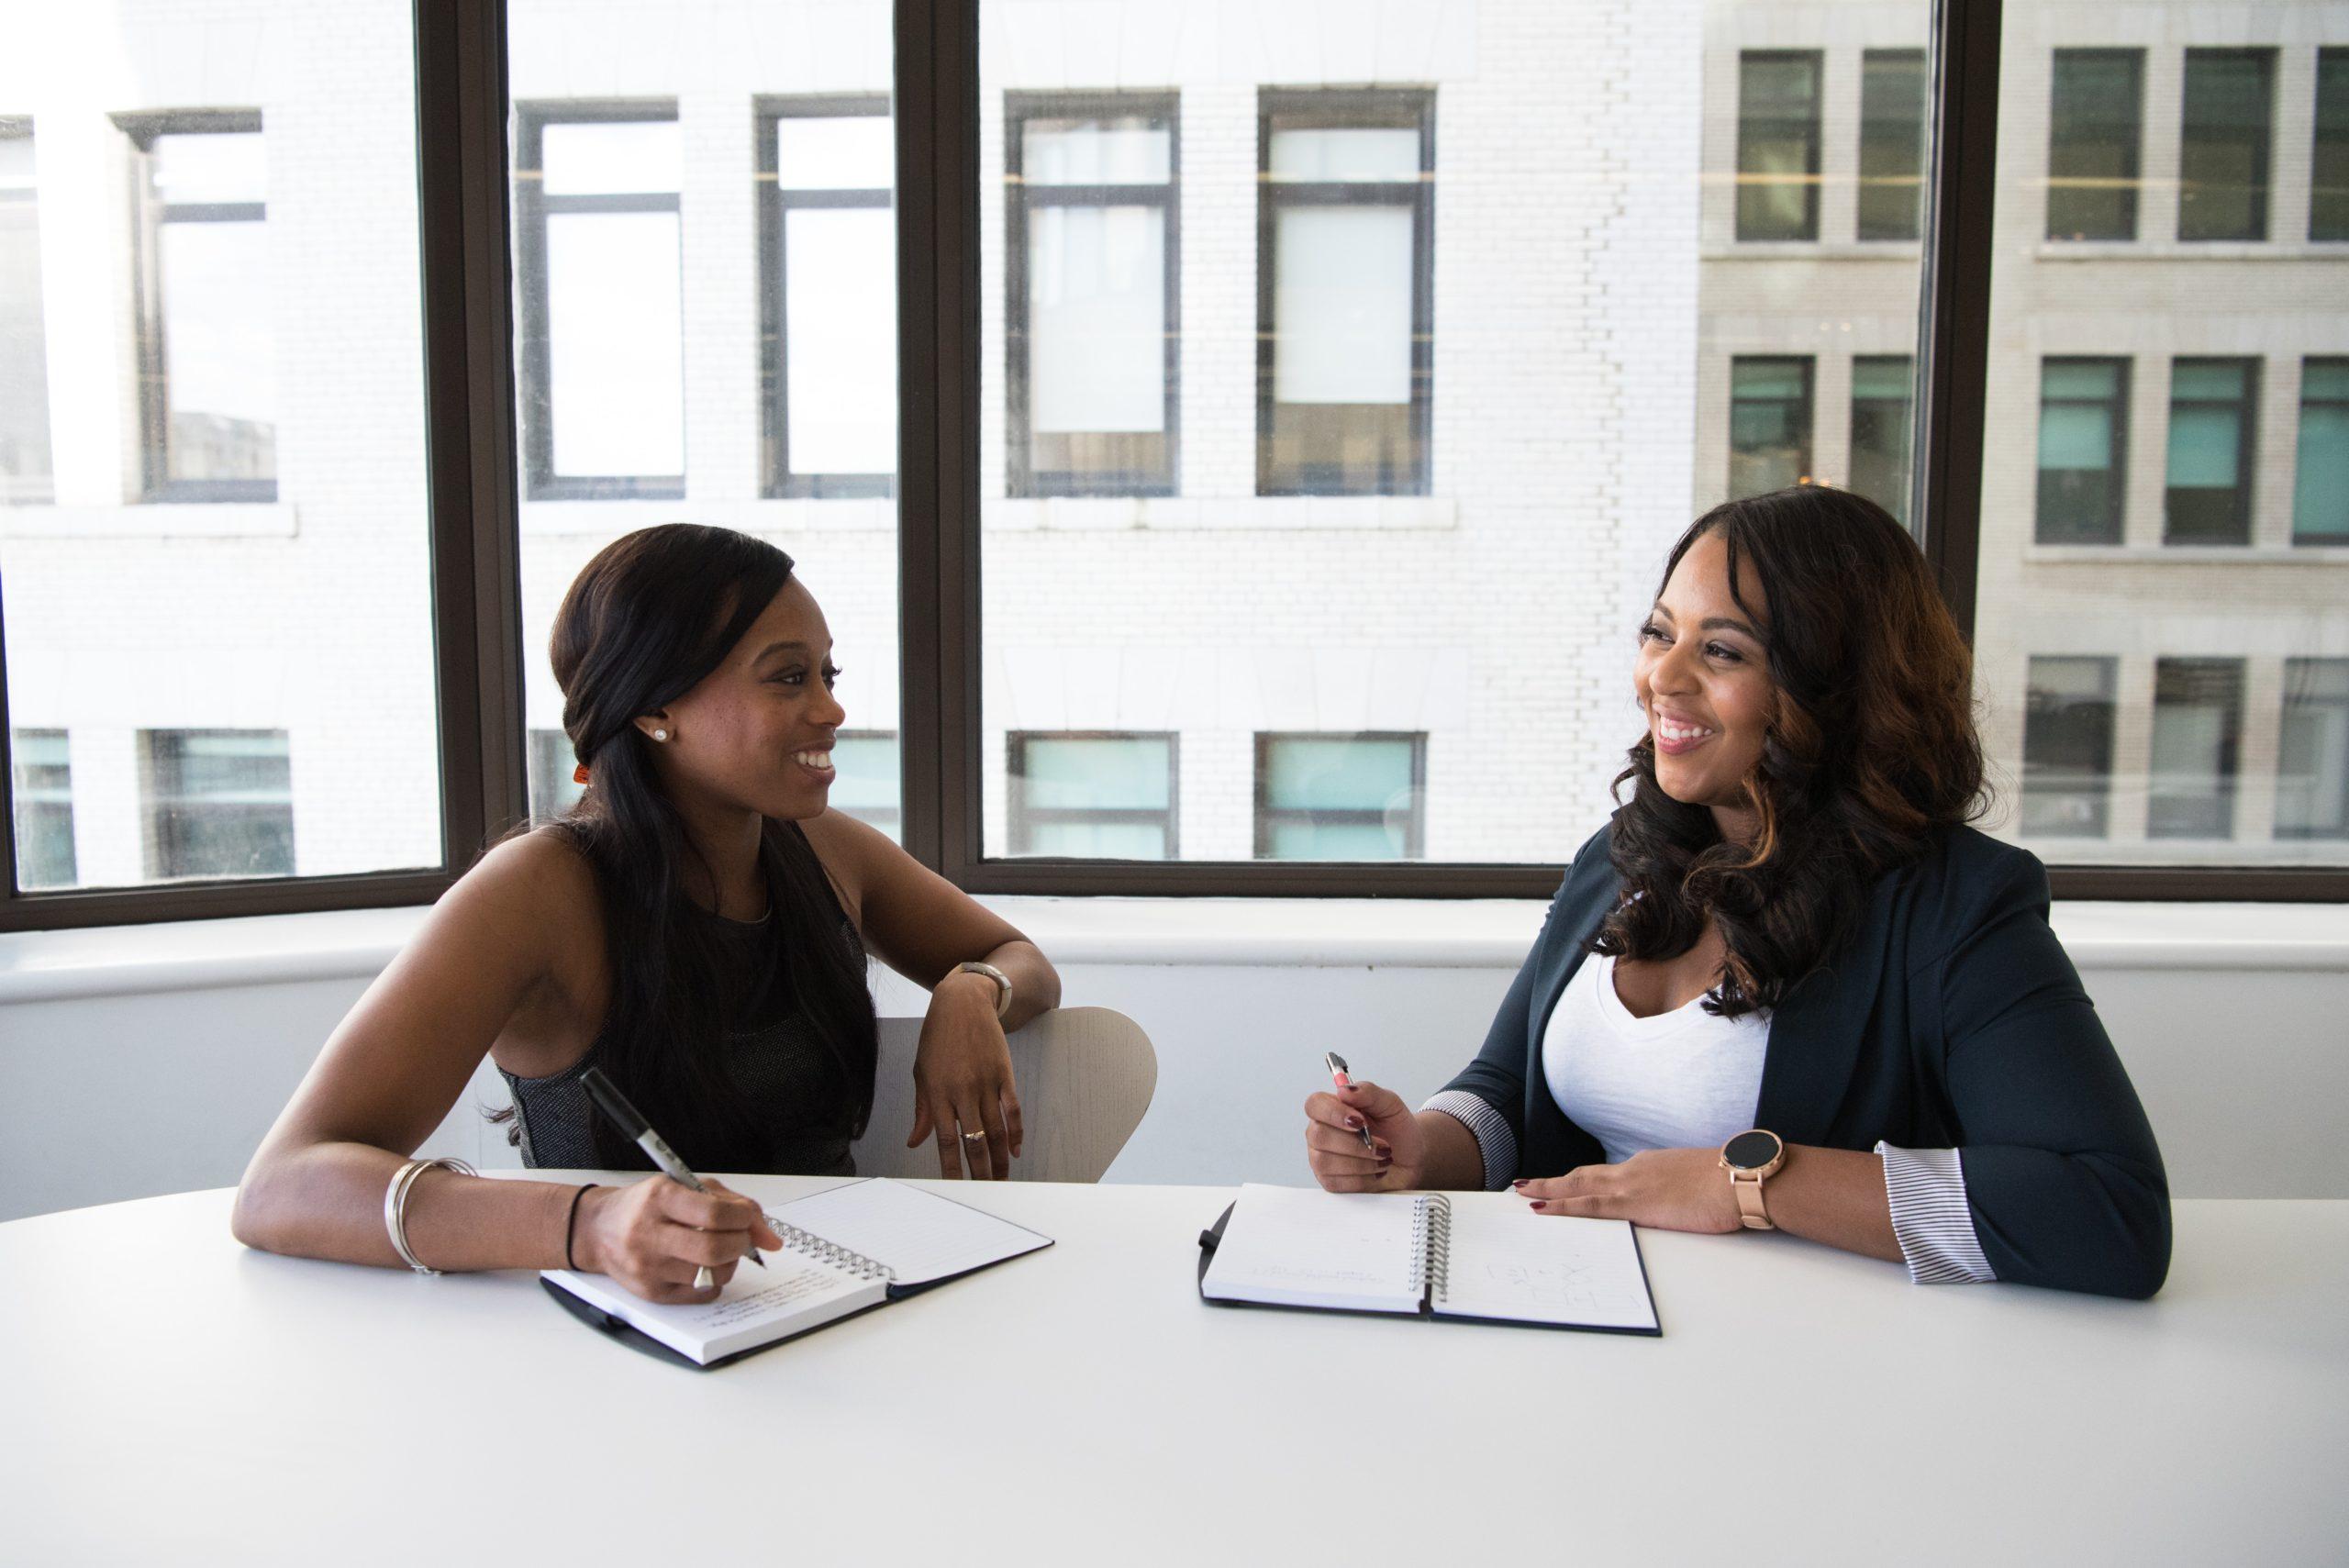 Human resources recruitment services